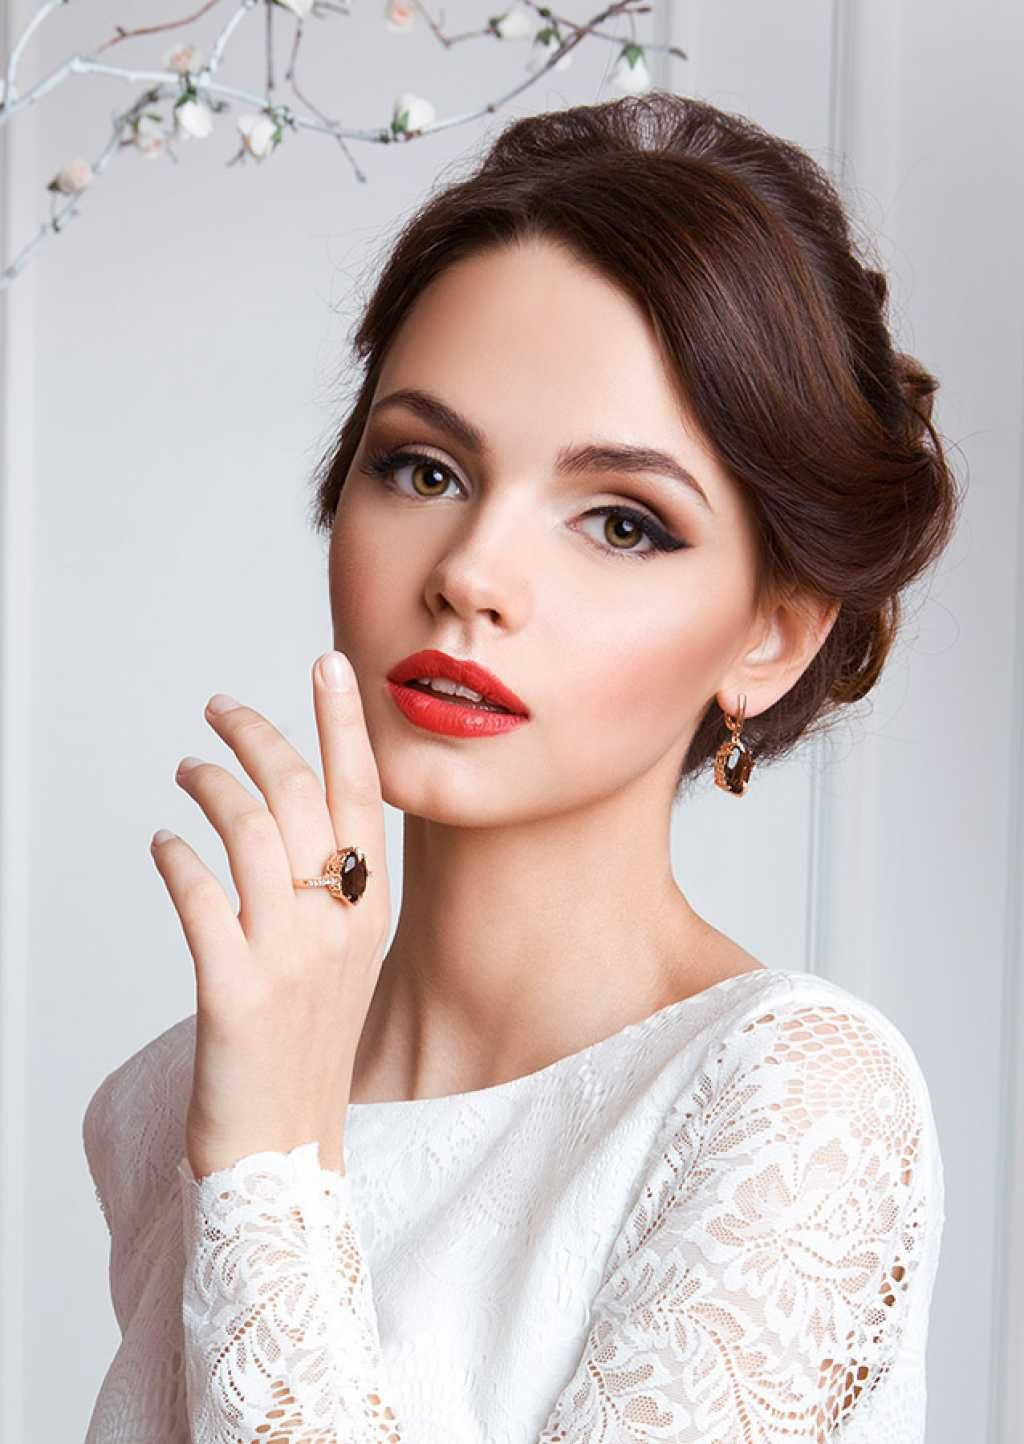 bridal makeup for hazel eyes :: one1lady :: #makeup